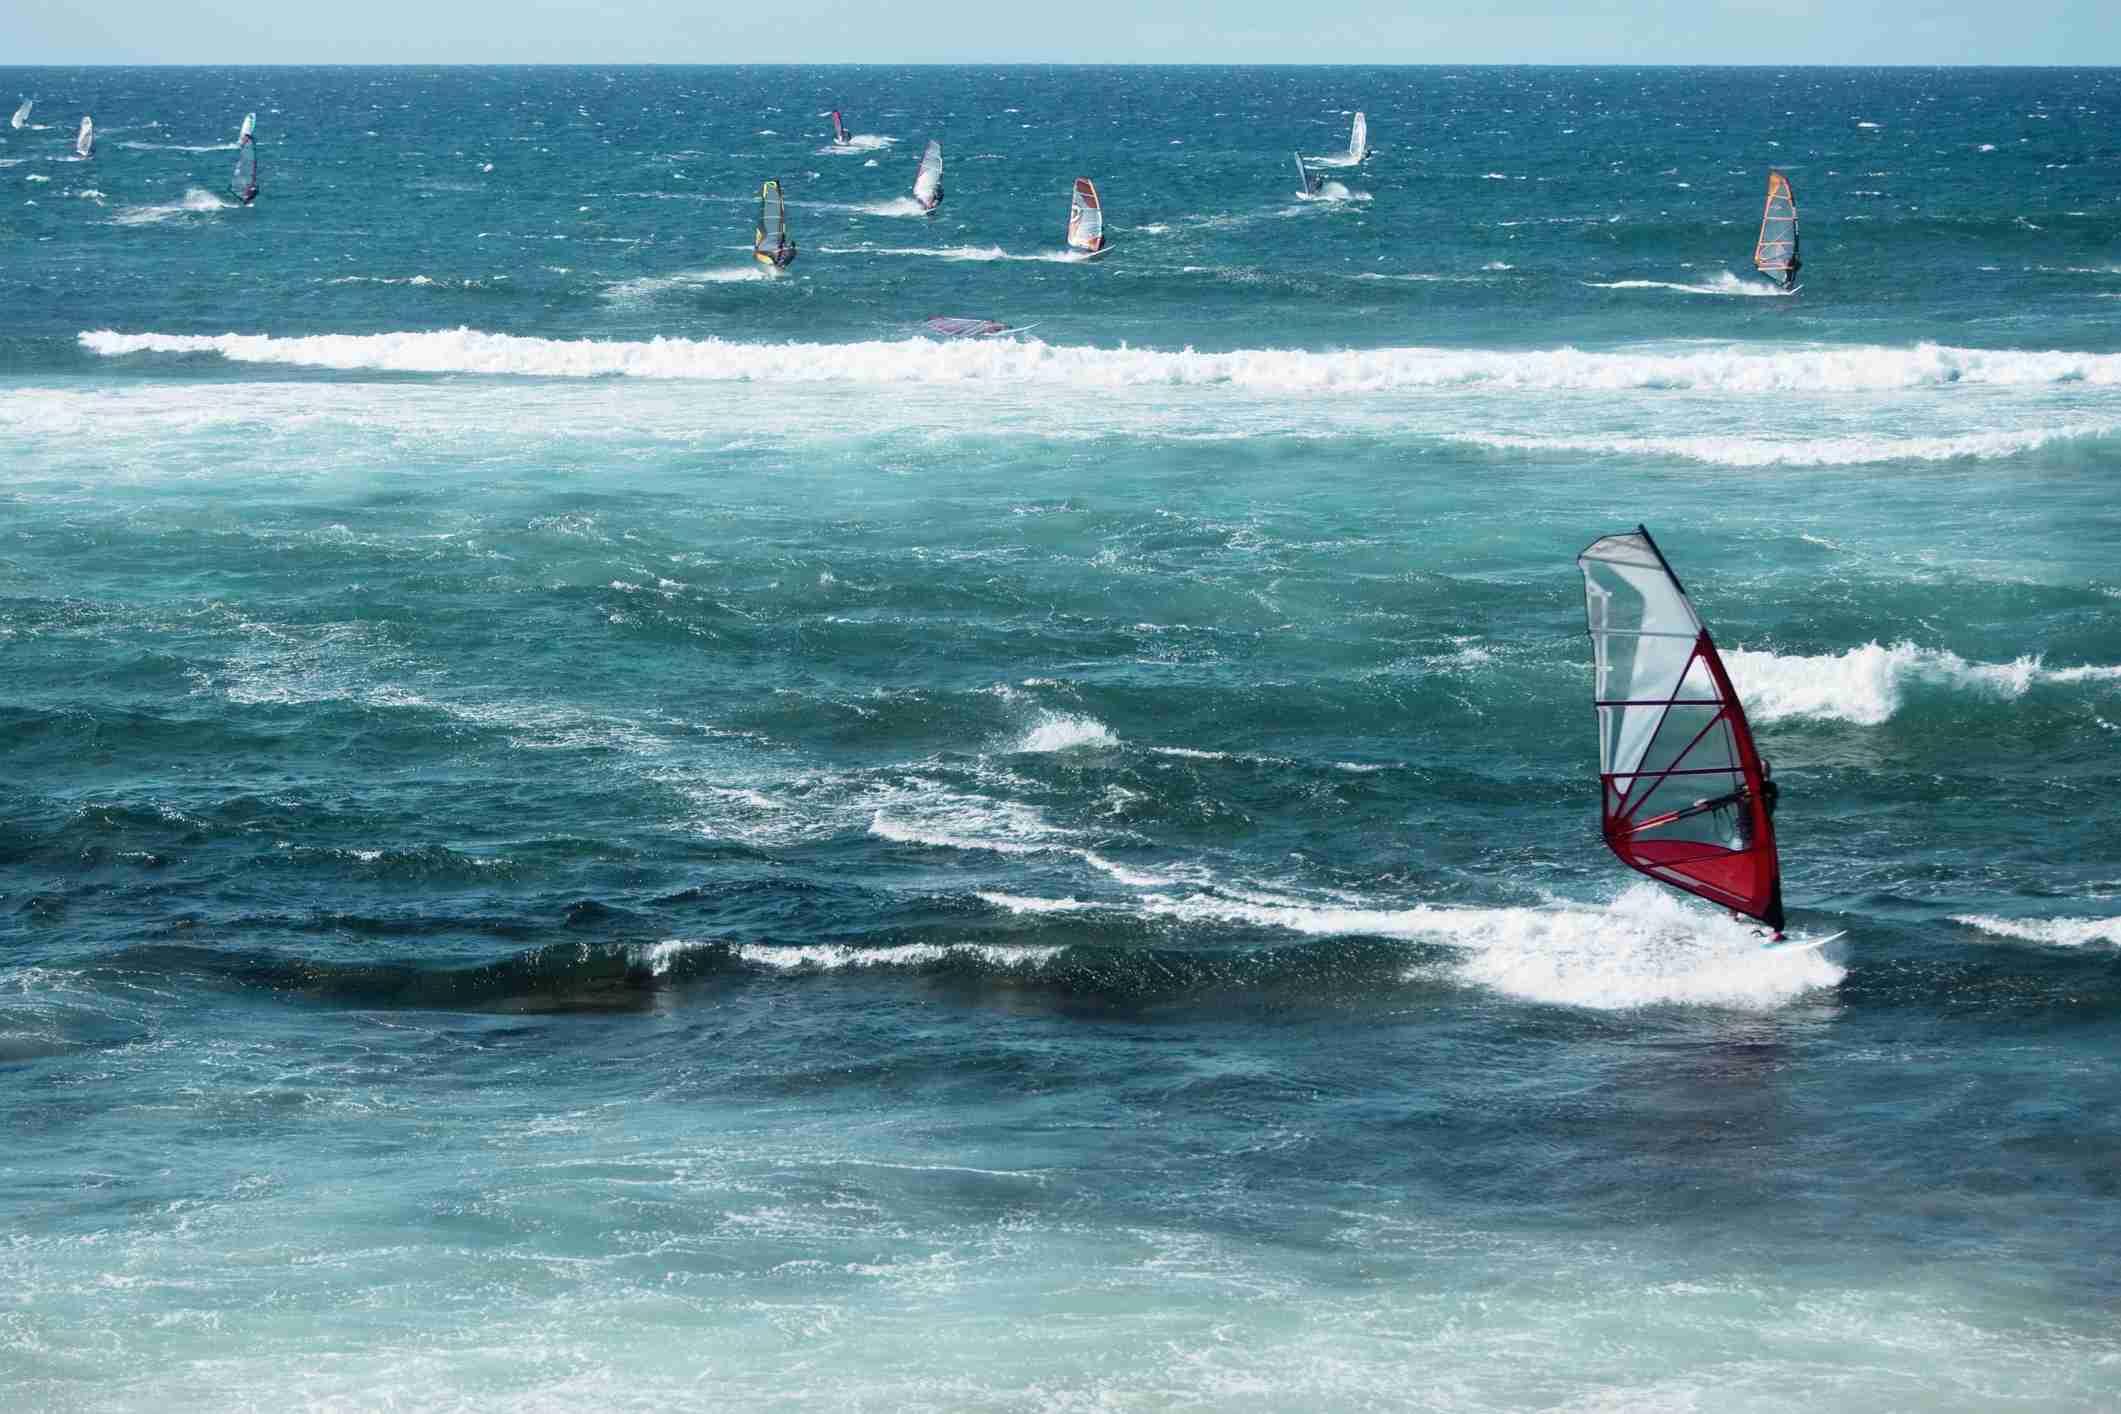 Windsurfing boards in the sea, Hookipa Beach, Maui, Hawaii Islands, USA